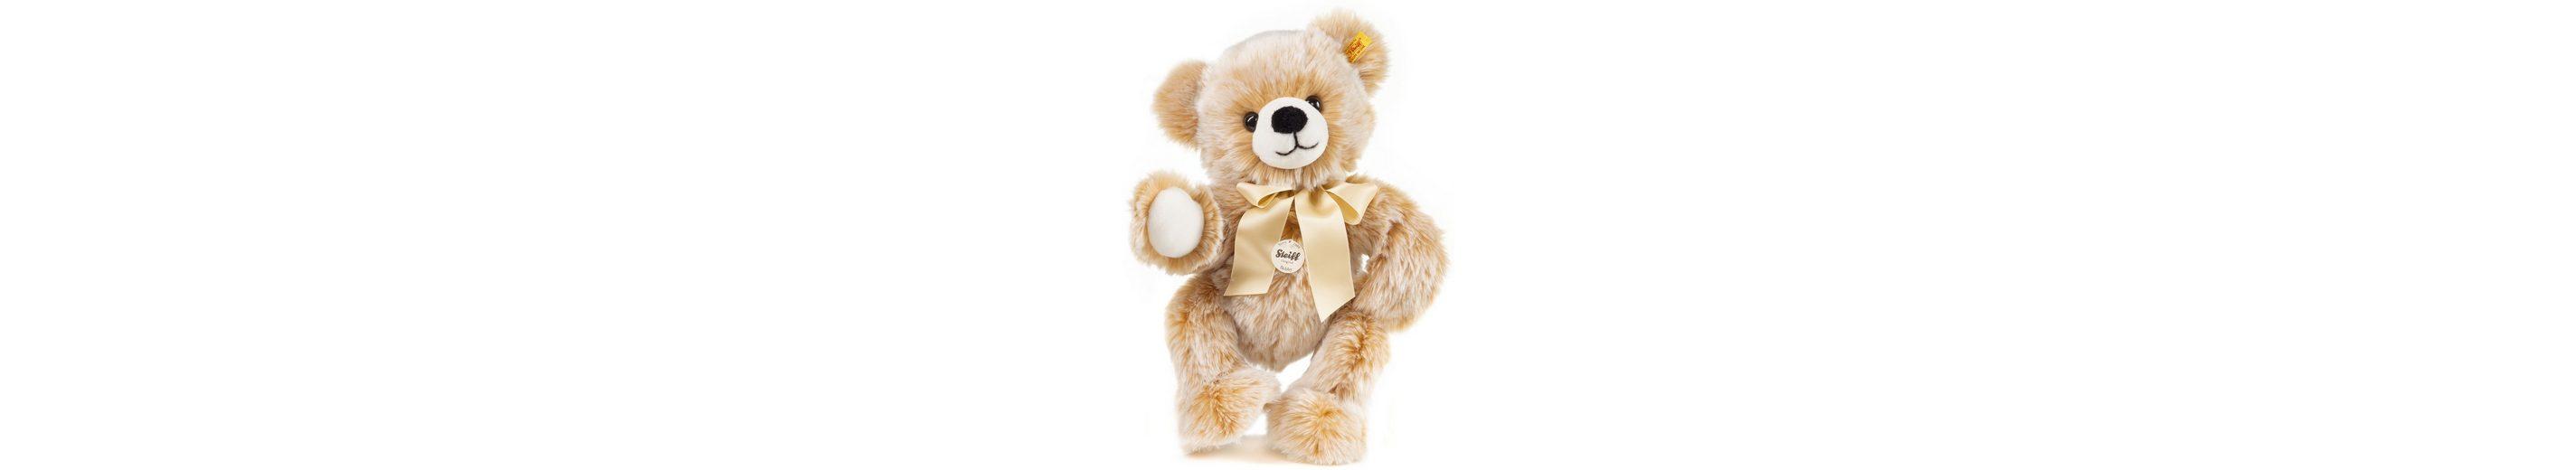 Steiff Plüschtier, 40 cm, »Bobby Schlenker-Teddybär«